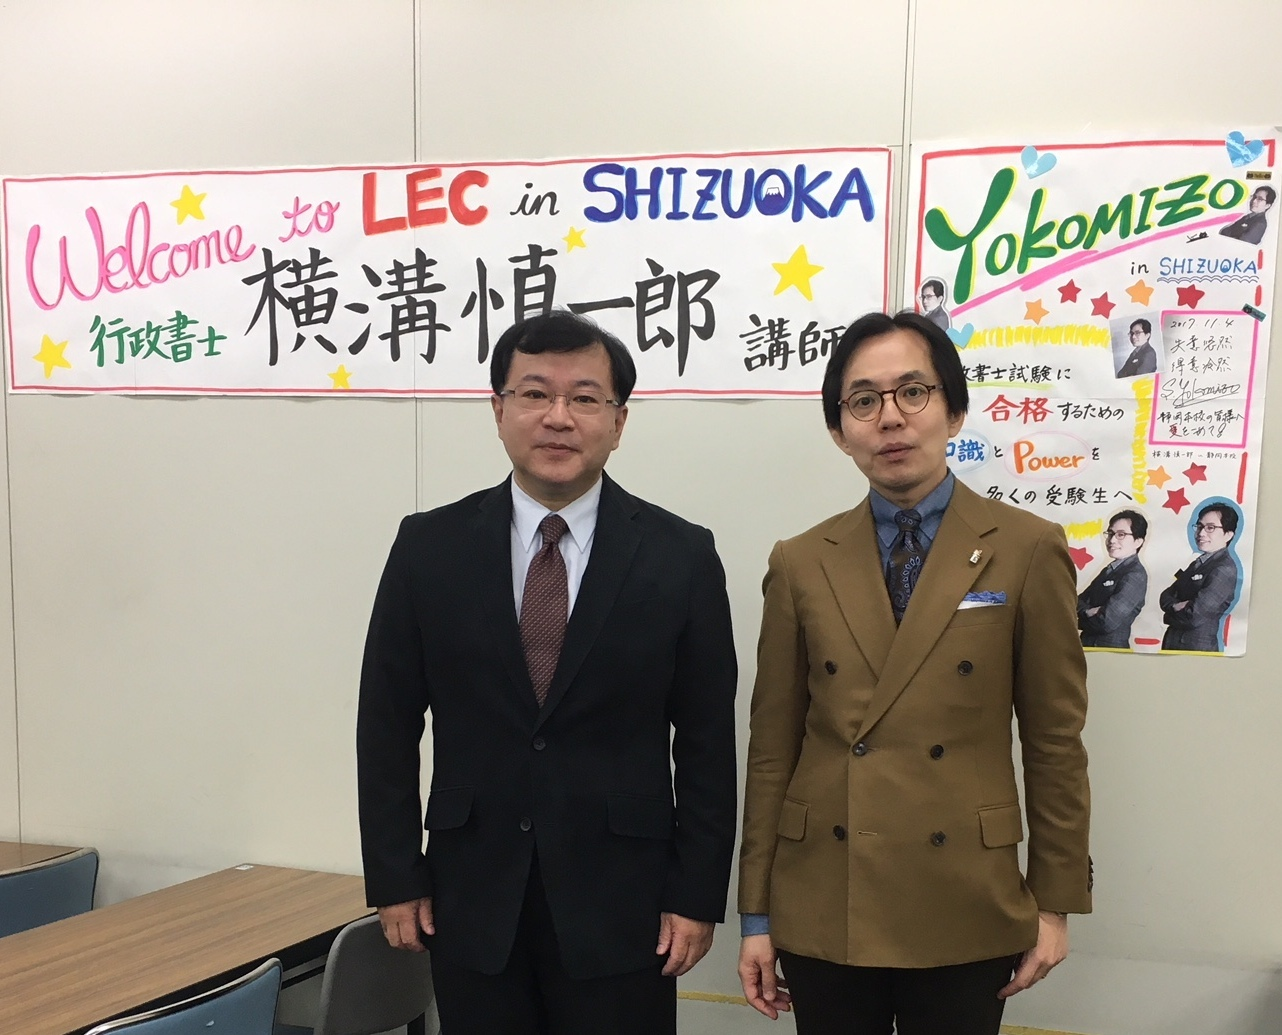 20181104_yoko_shimo1.jpg